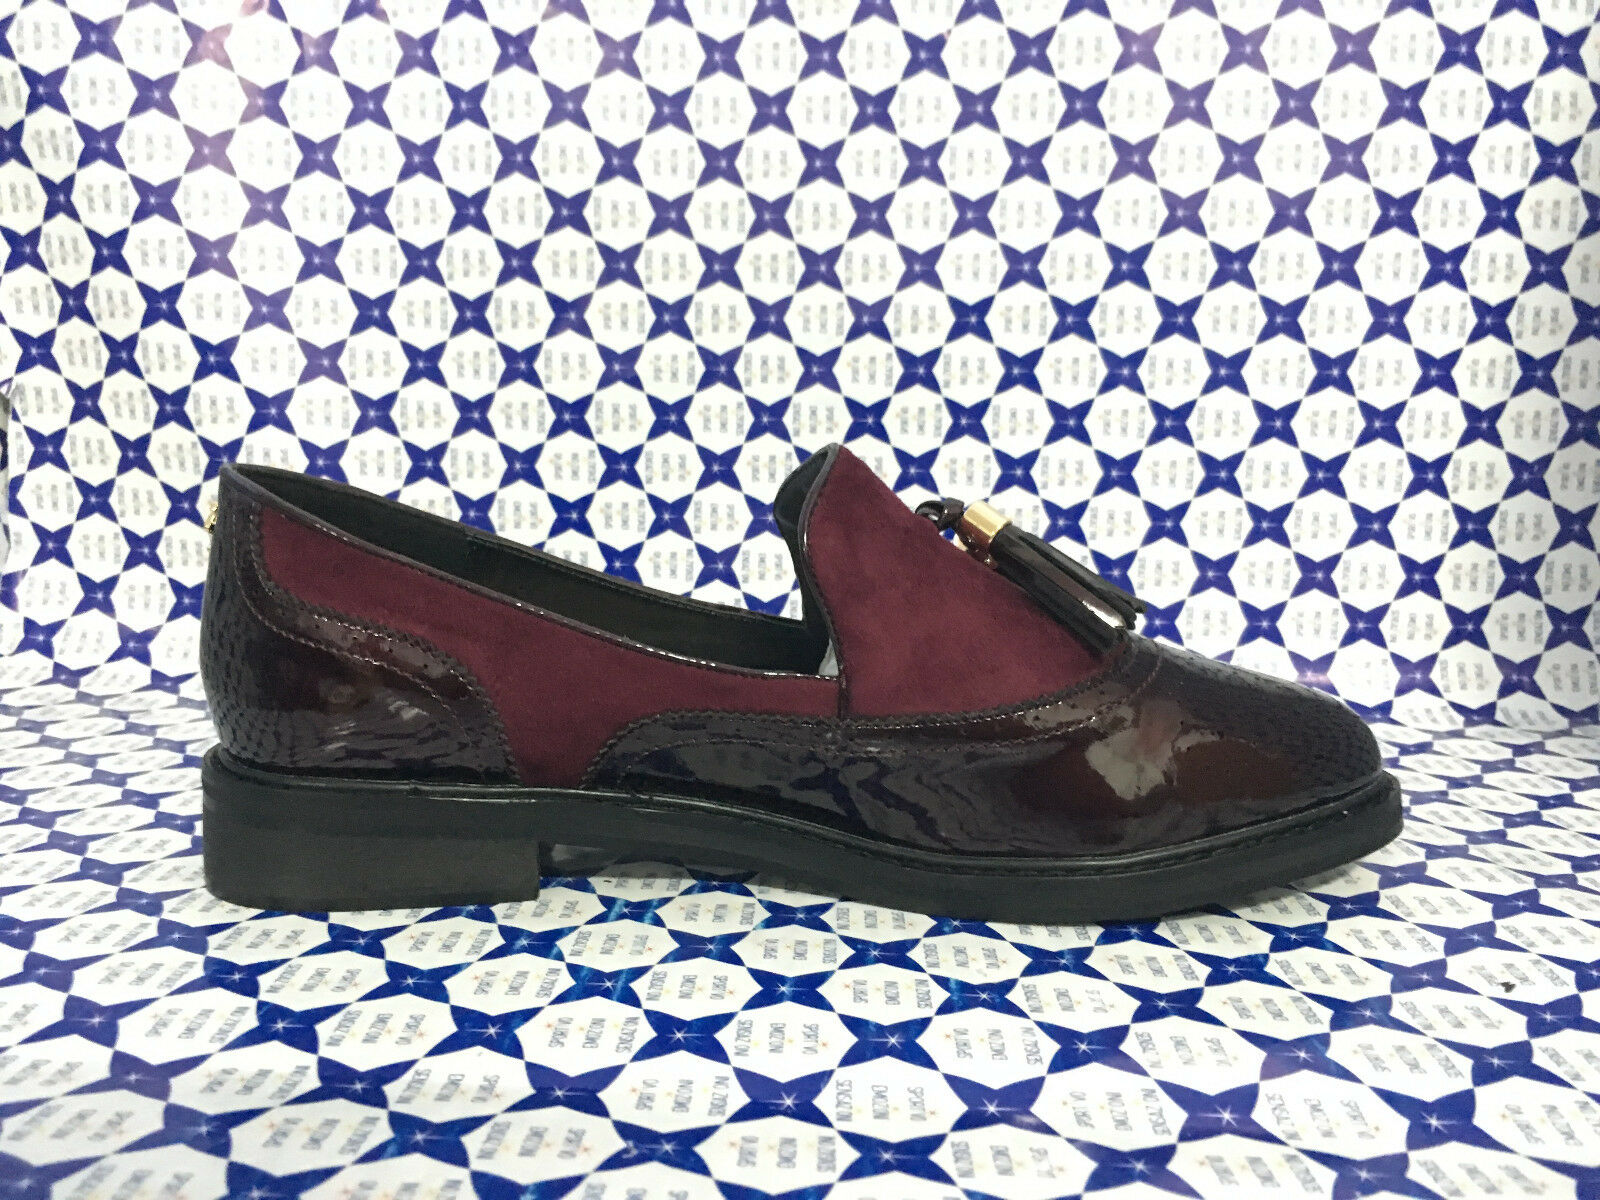 shoes Menbur women women women - Mocassino Coda di Rondine Nappine - Bordeaux - 7746 cb94f2